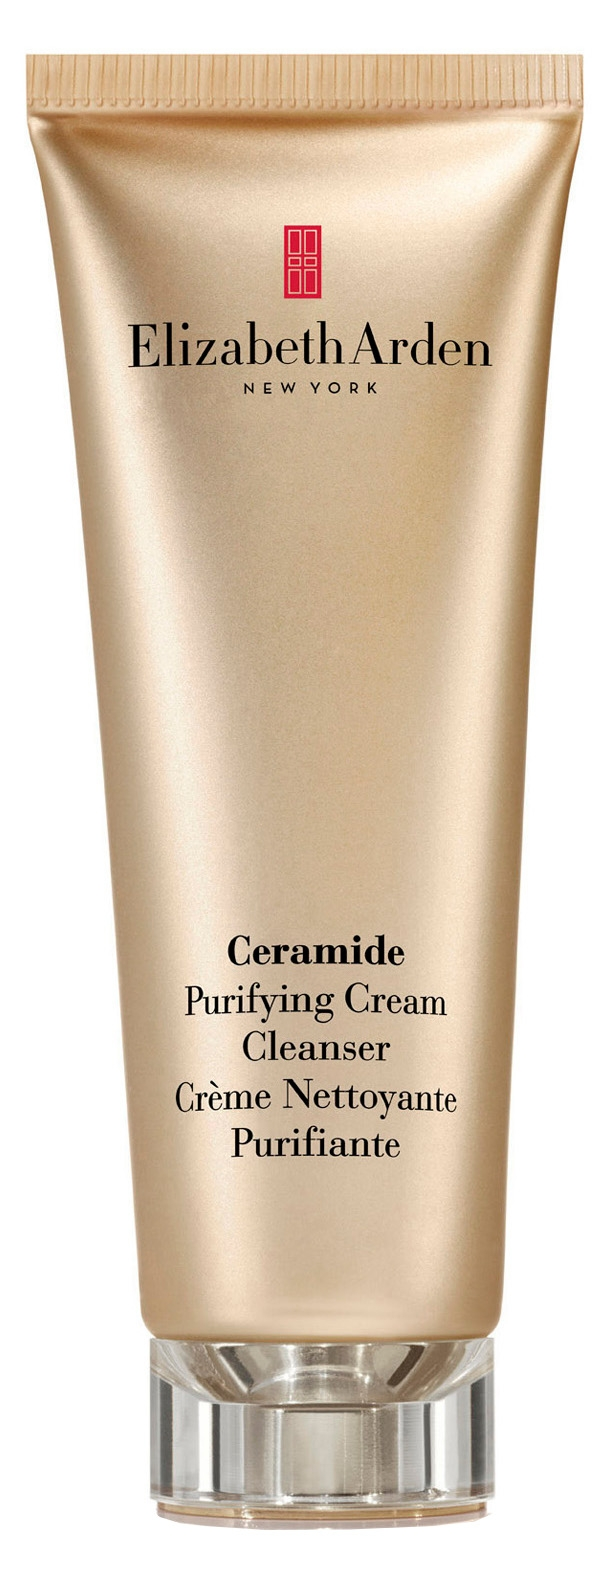 Elizabeth Arden Ceramide Purifying Cream Cleanser (W) mleczko do demakijażu 125ml